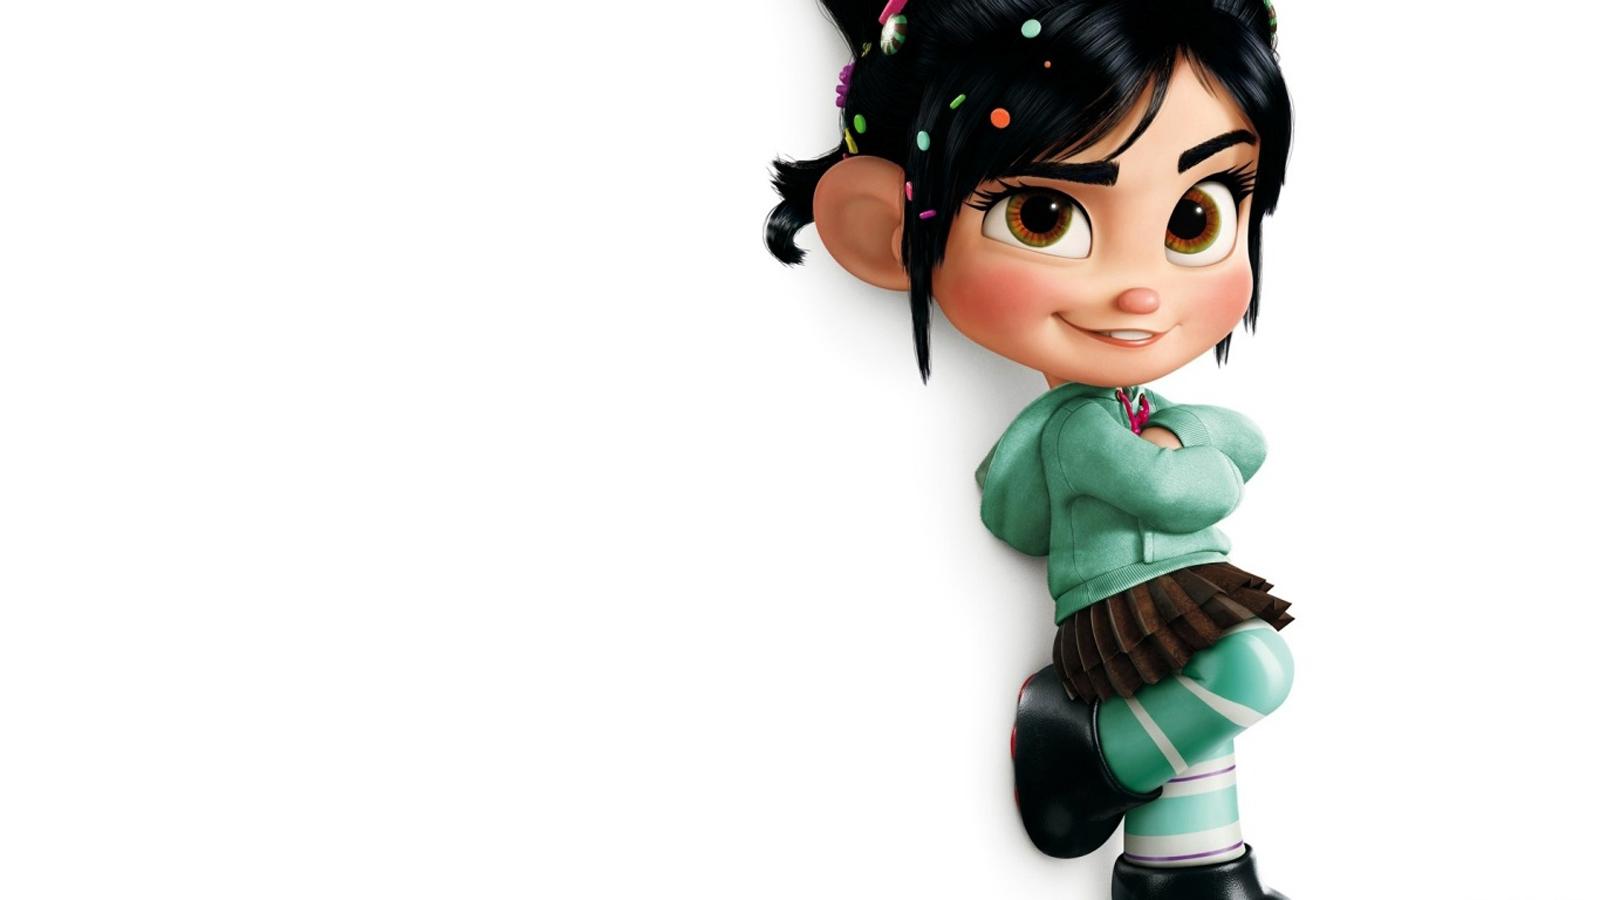 Disney wreck it ralph 3d animation hd wallpapers